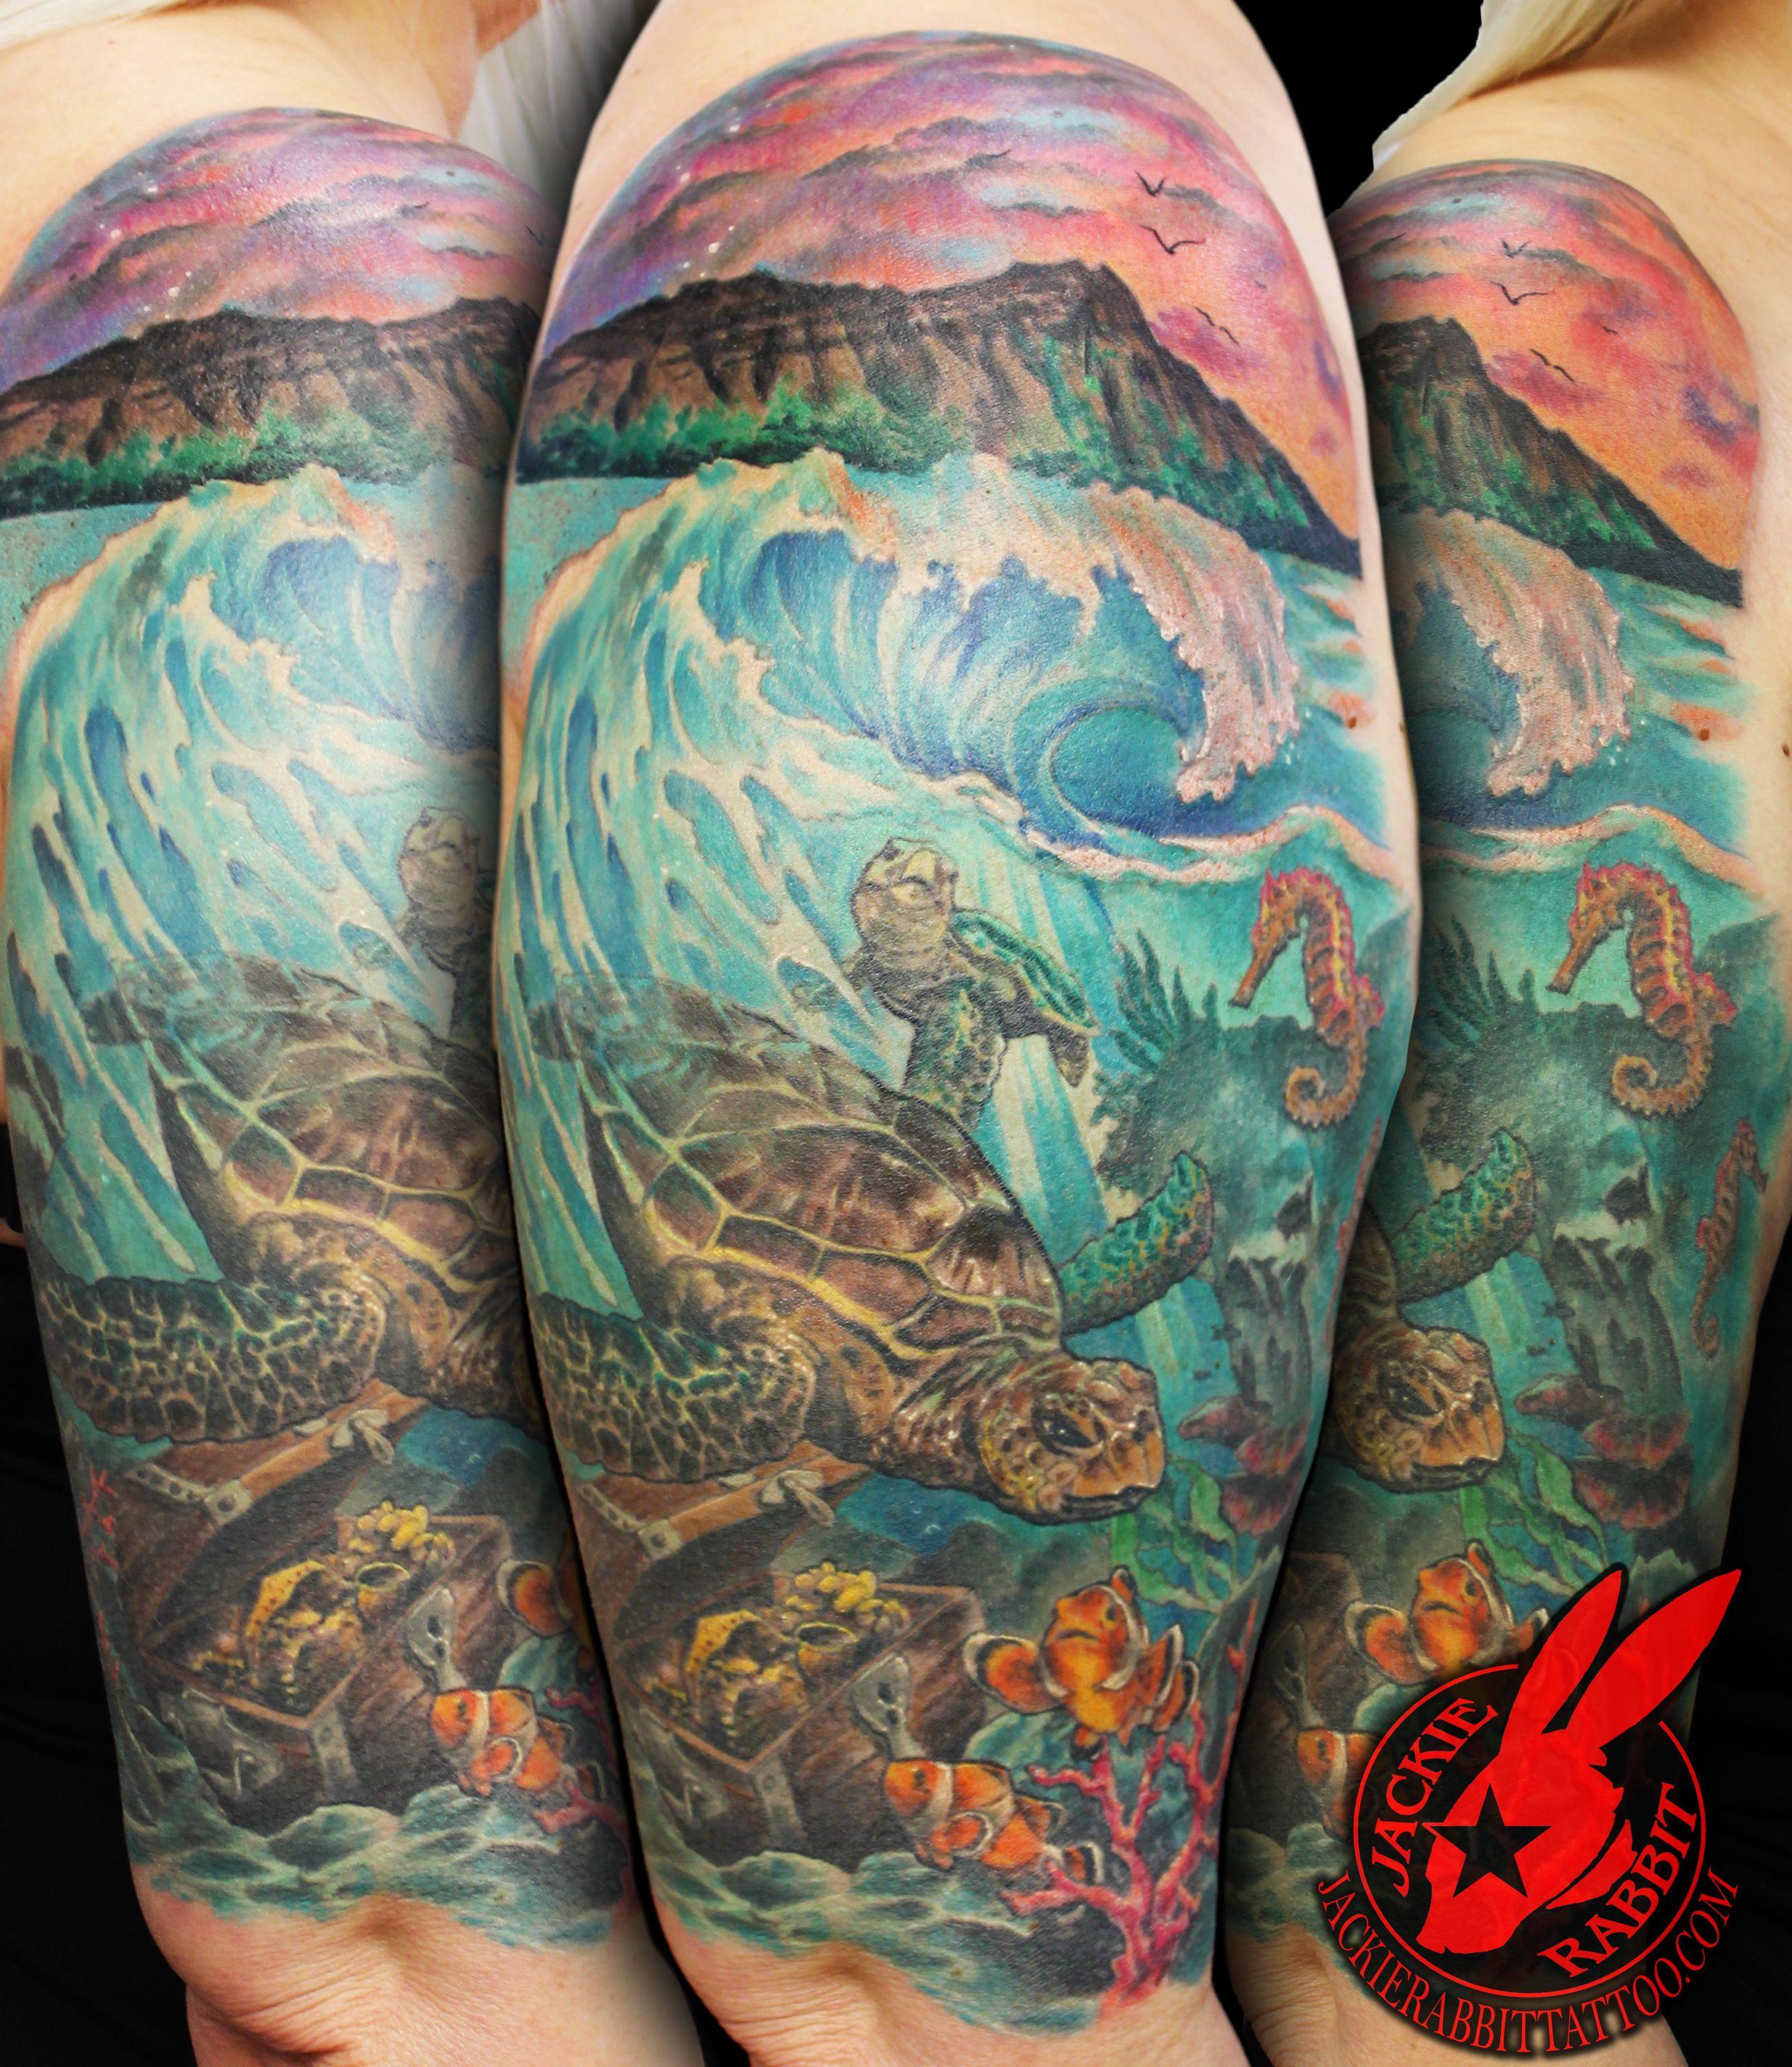 Underwater tattoo | Tattoos | Pinterest | Underwater tattoo ...